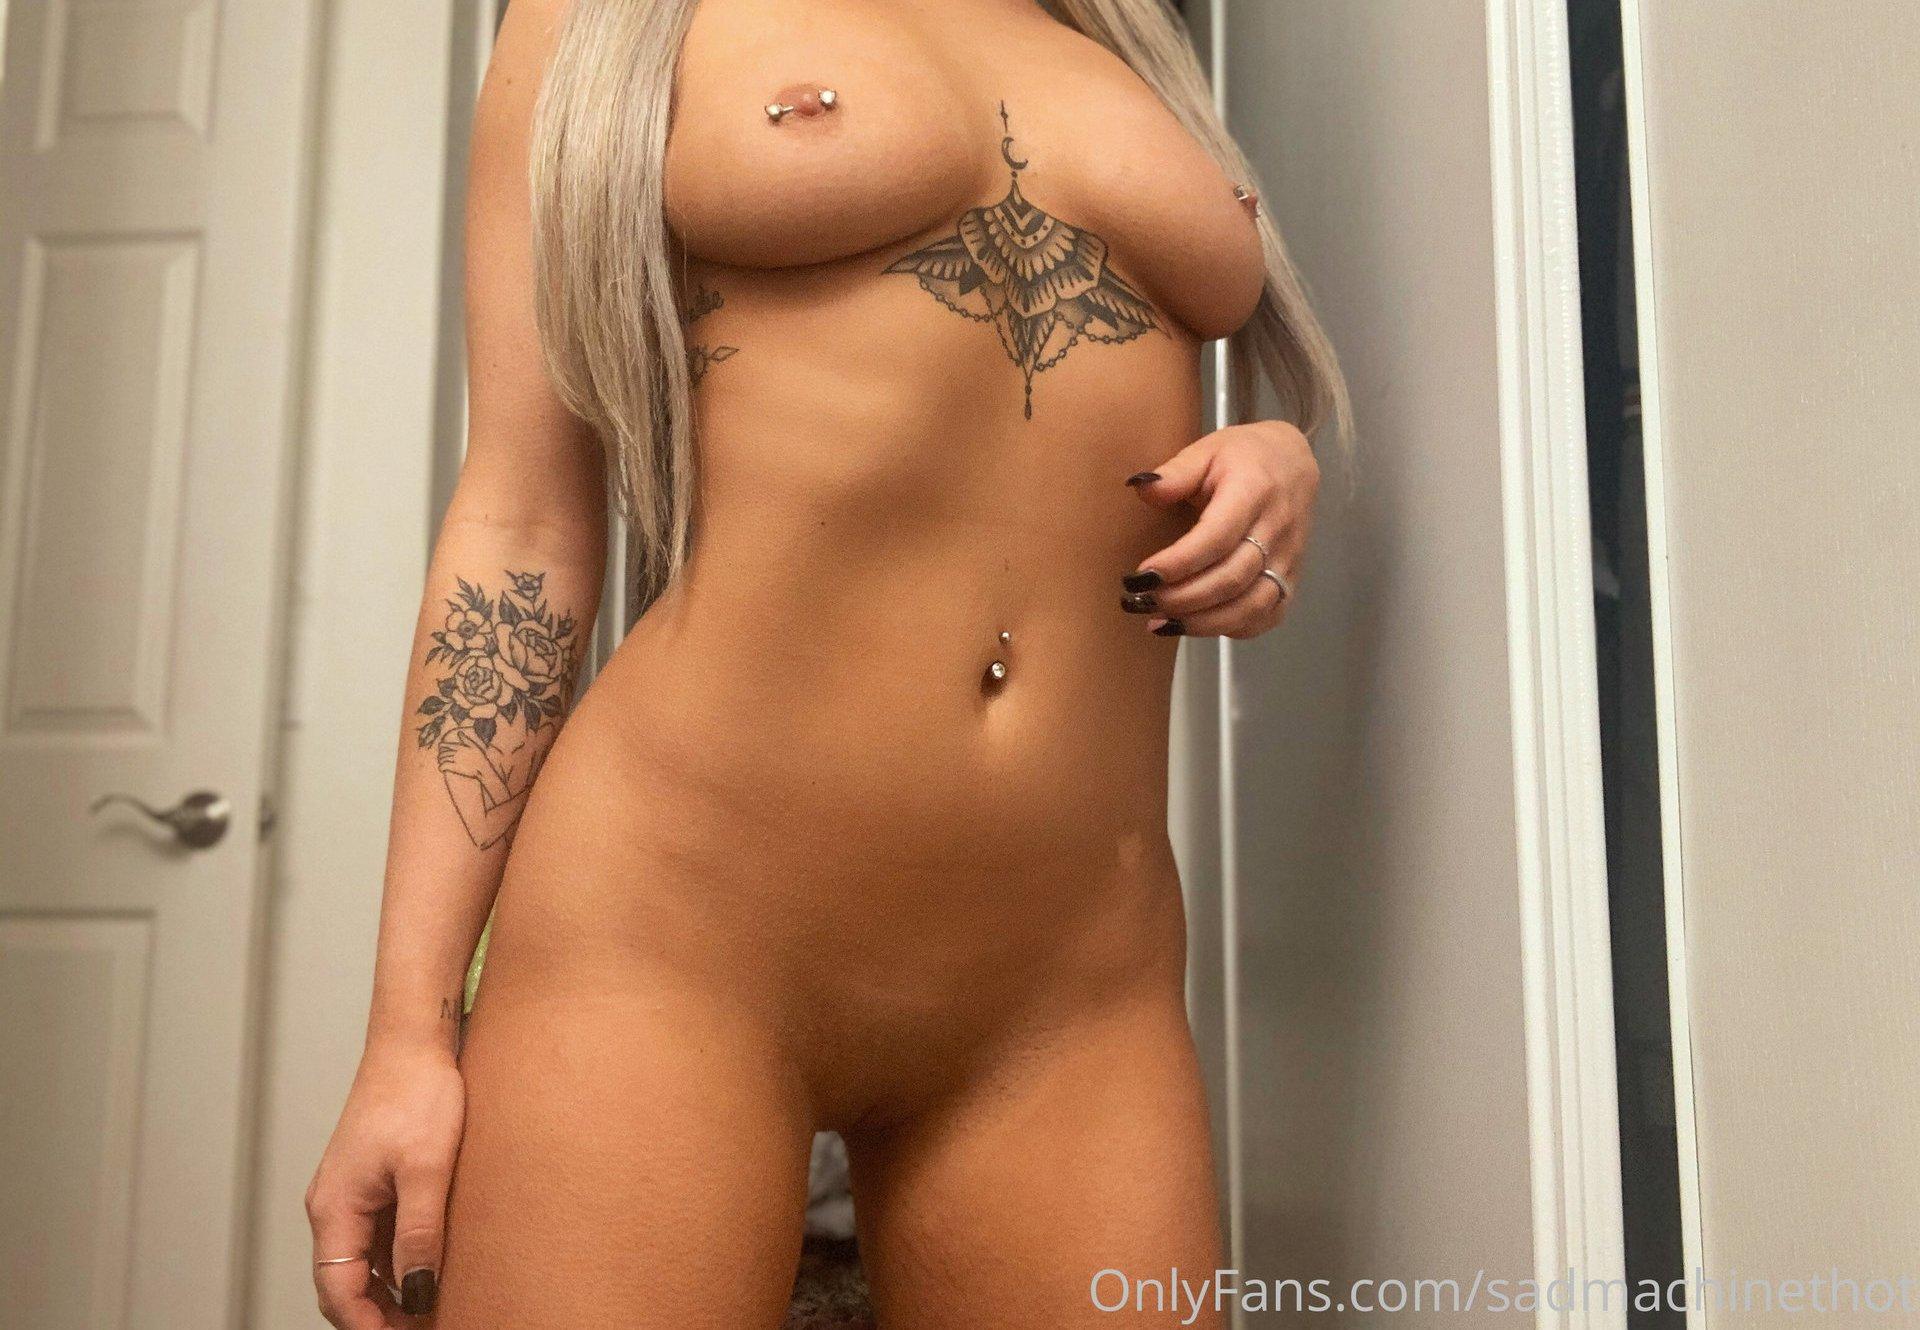 Jill Sadmachinethot Onlyfans Nude Leaks 0005